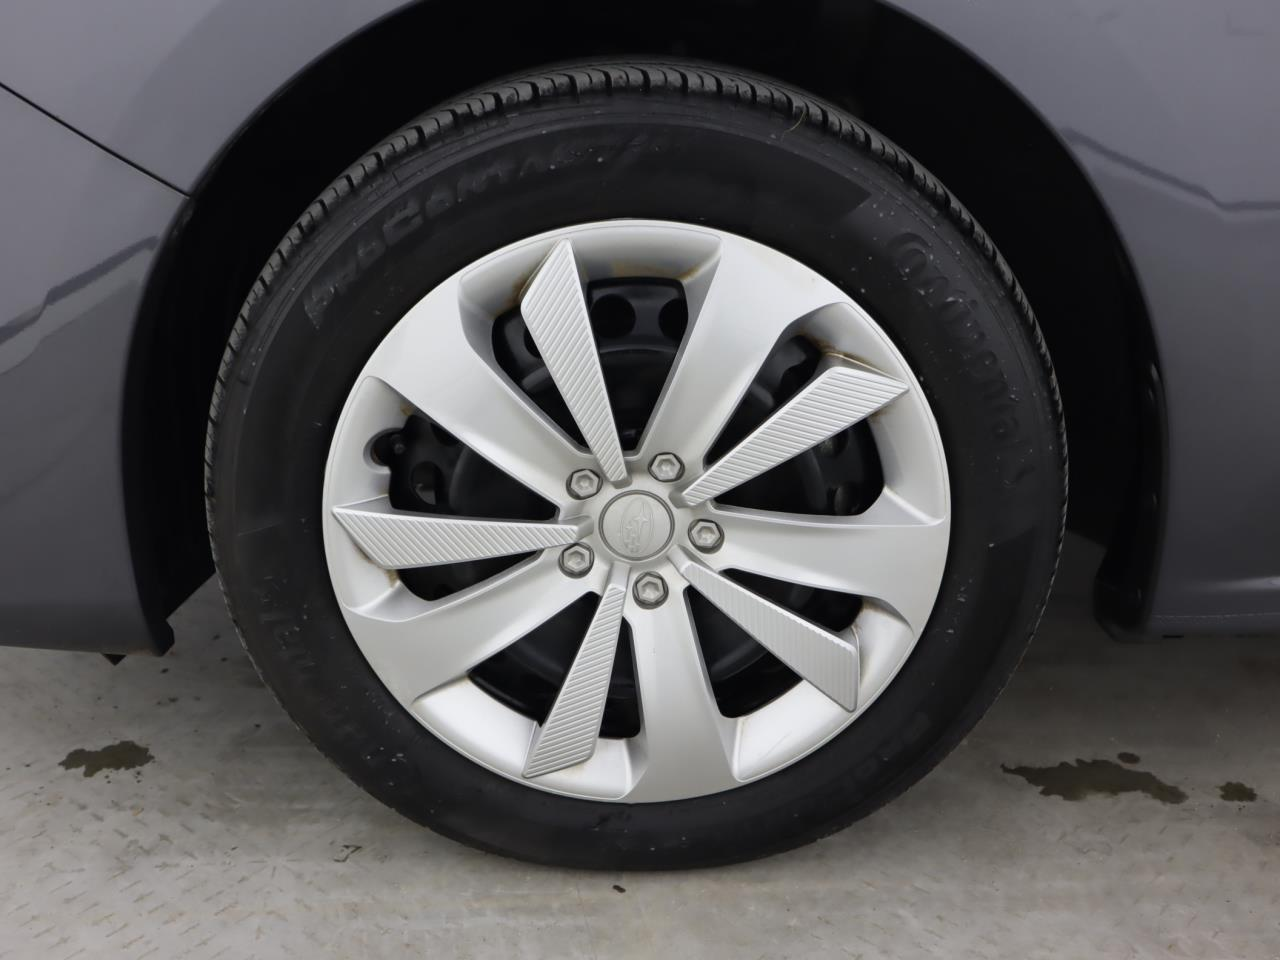 used vehicle - Hatchback SUBARU IMPREZA 2018